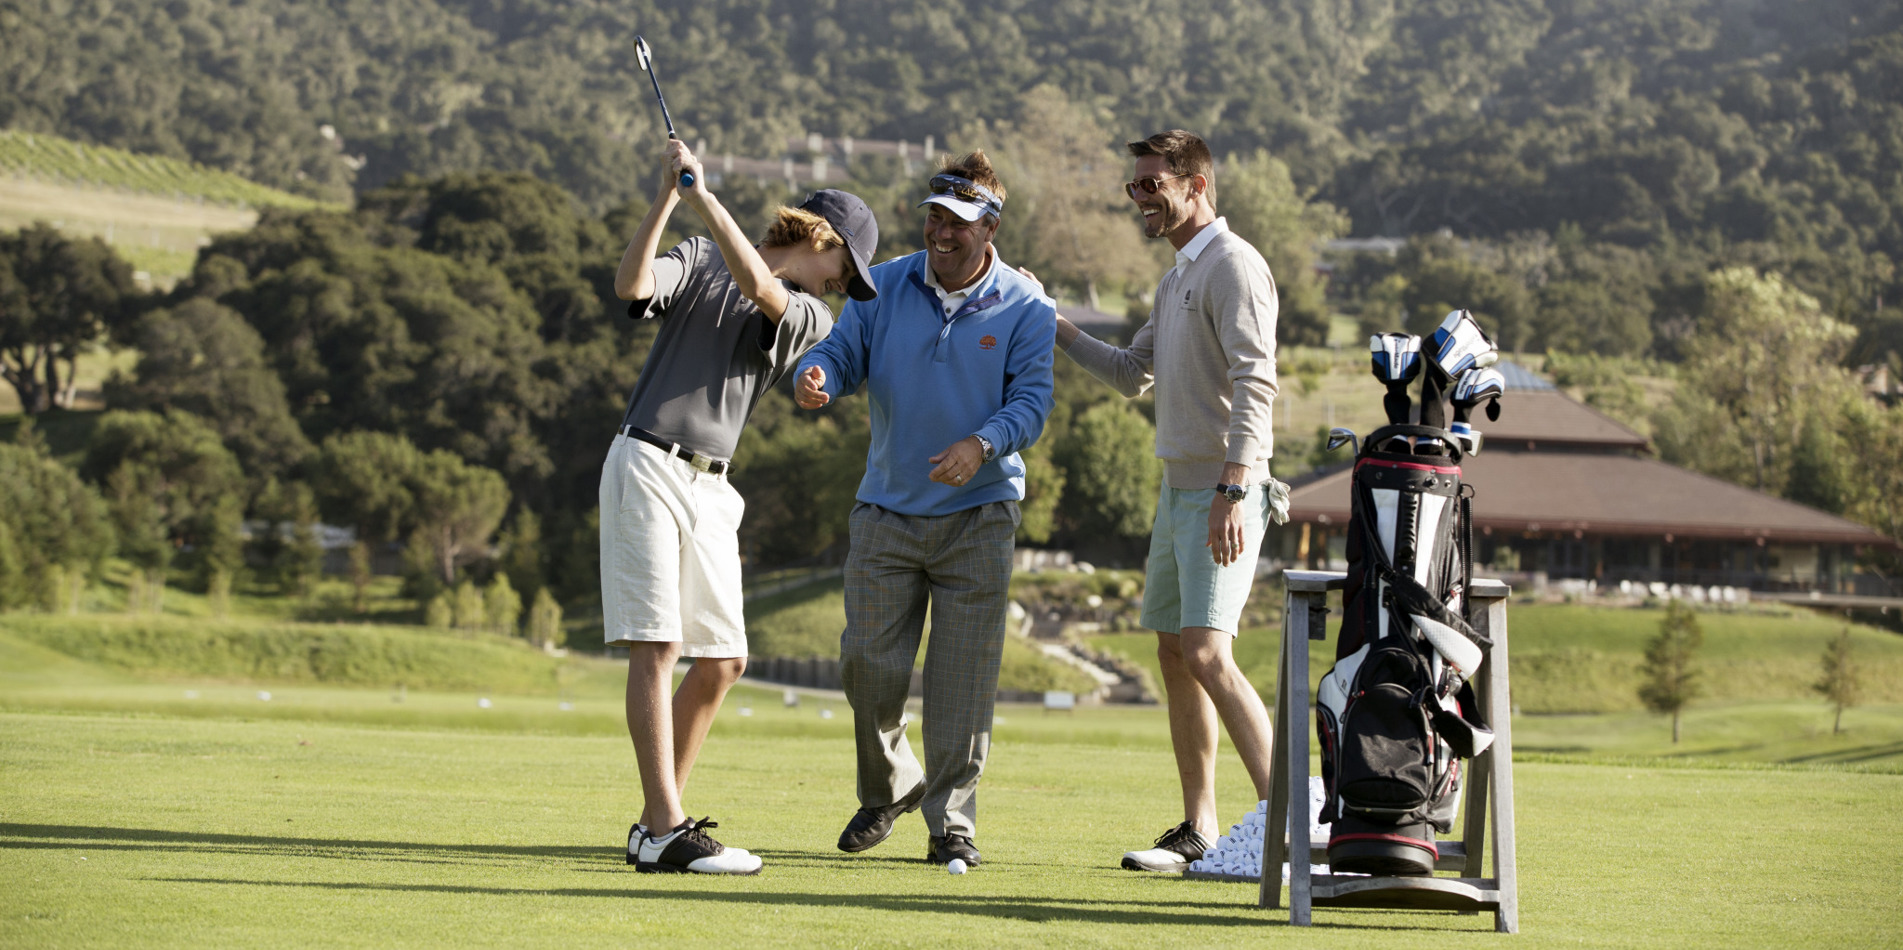 Carmel Valley Ranch_Golf_guys on course having fun